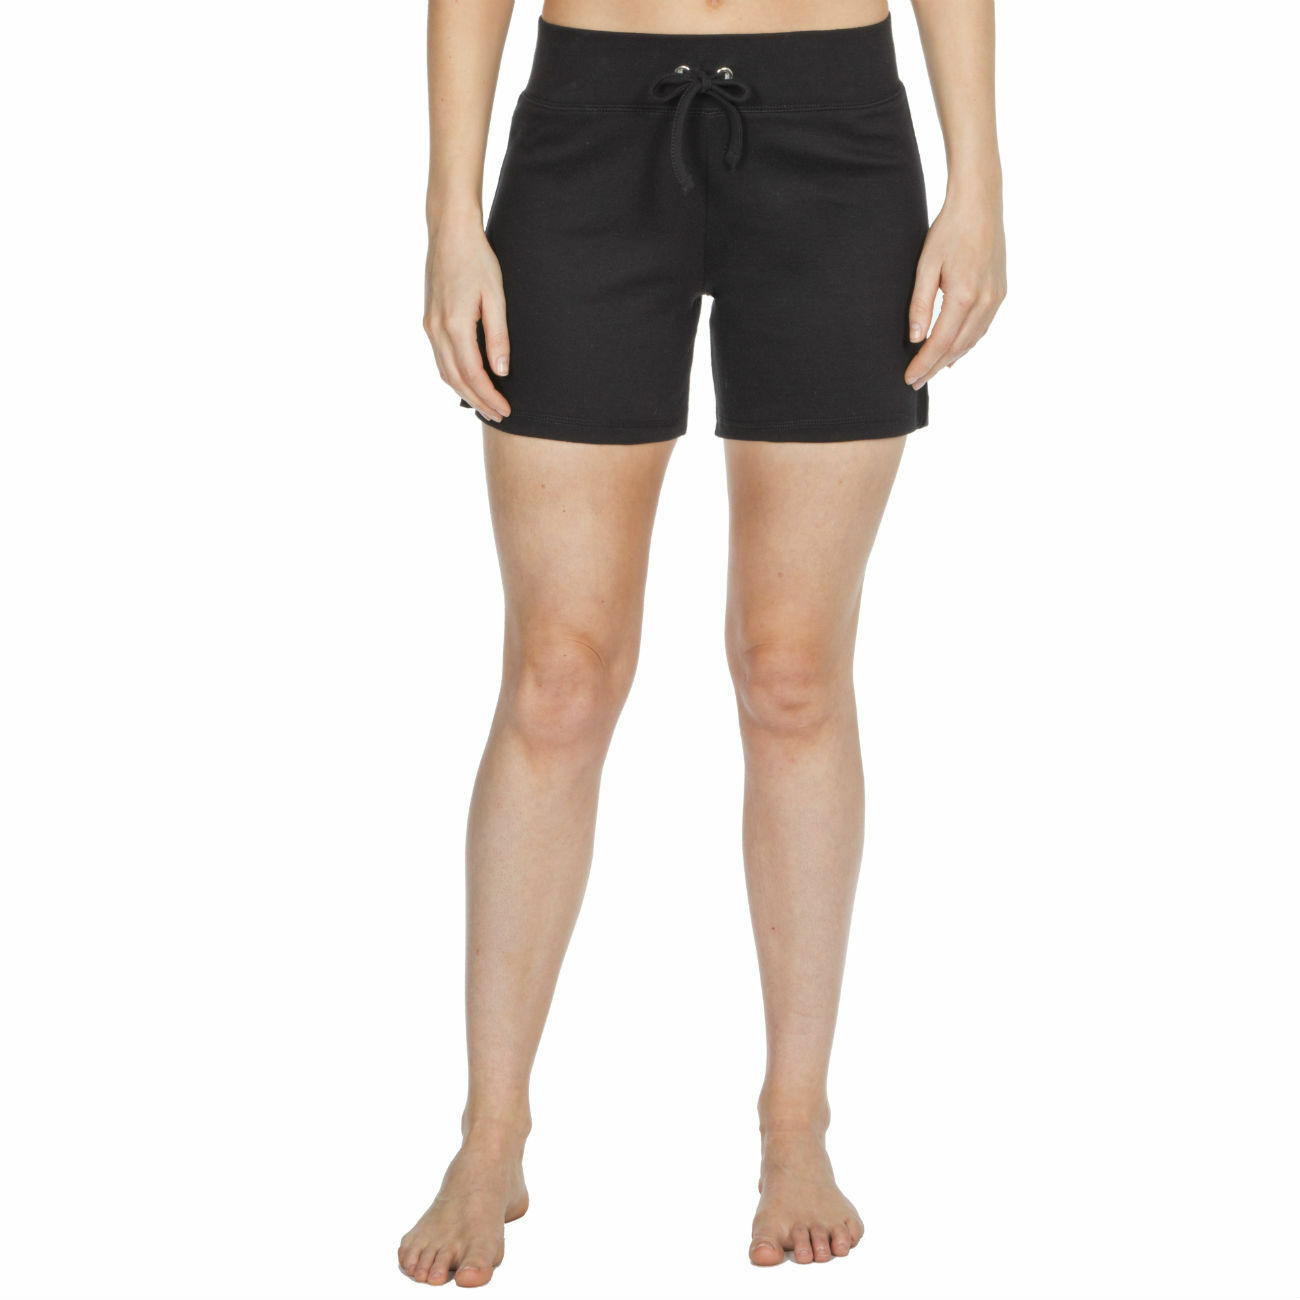 Womens-Cotton-Jersey-Shorts-Elastic-Waist-Summer-Beach-Casual-Yoga-Hot-Pants-New thumbnail 3